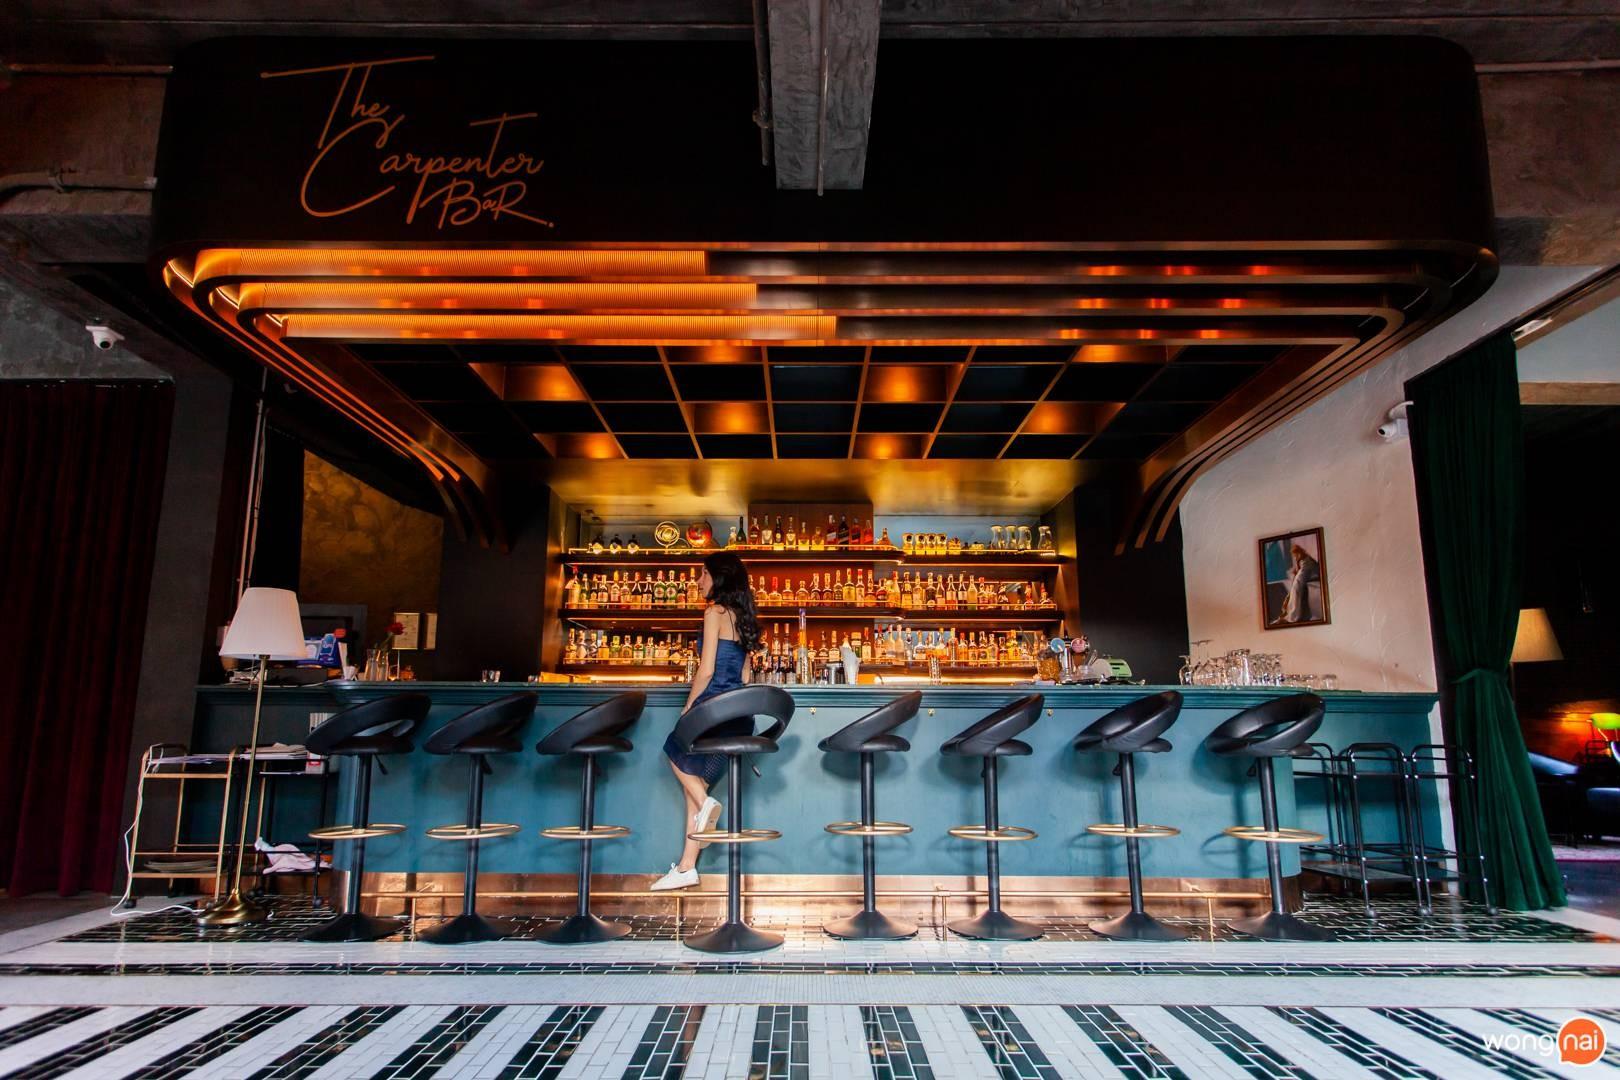 The Carpenter Bar